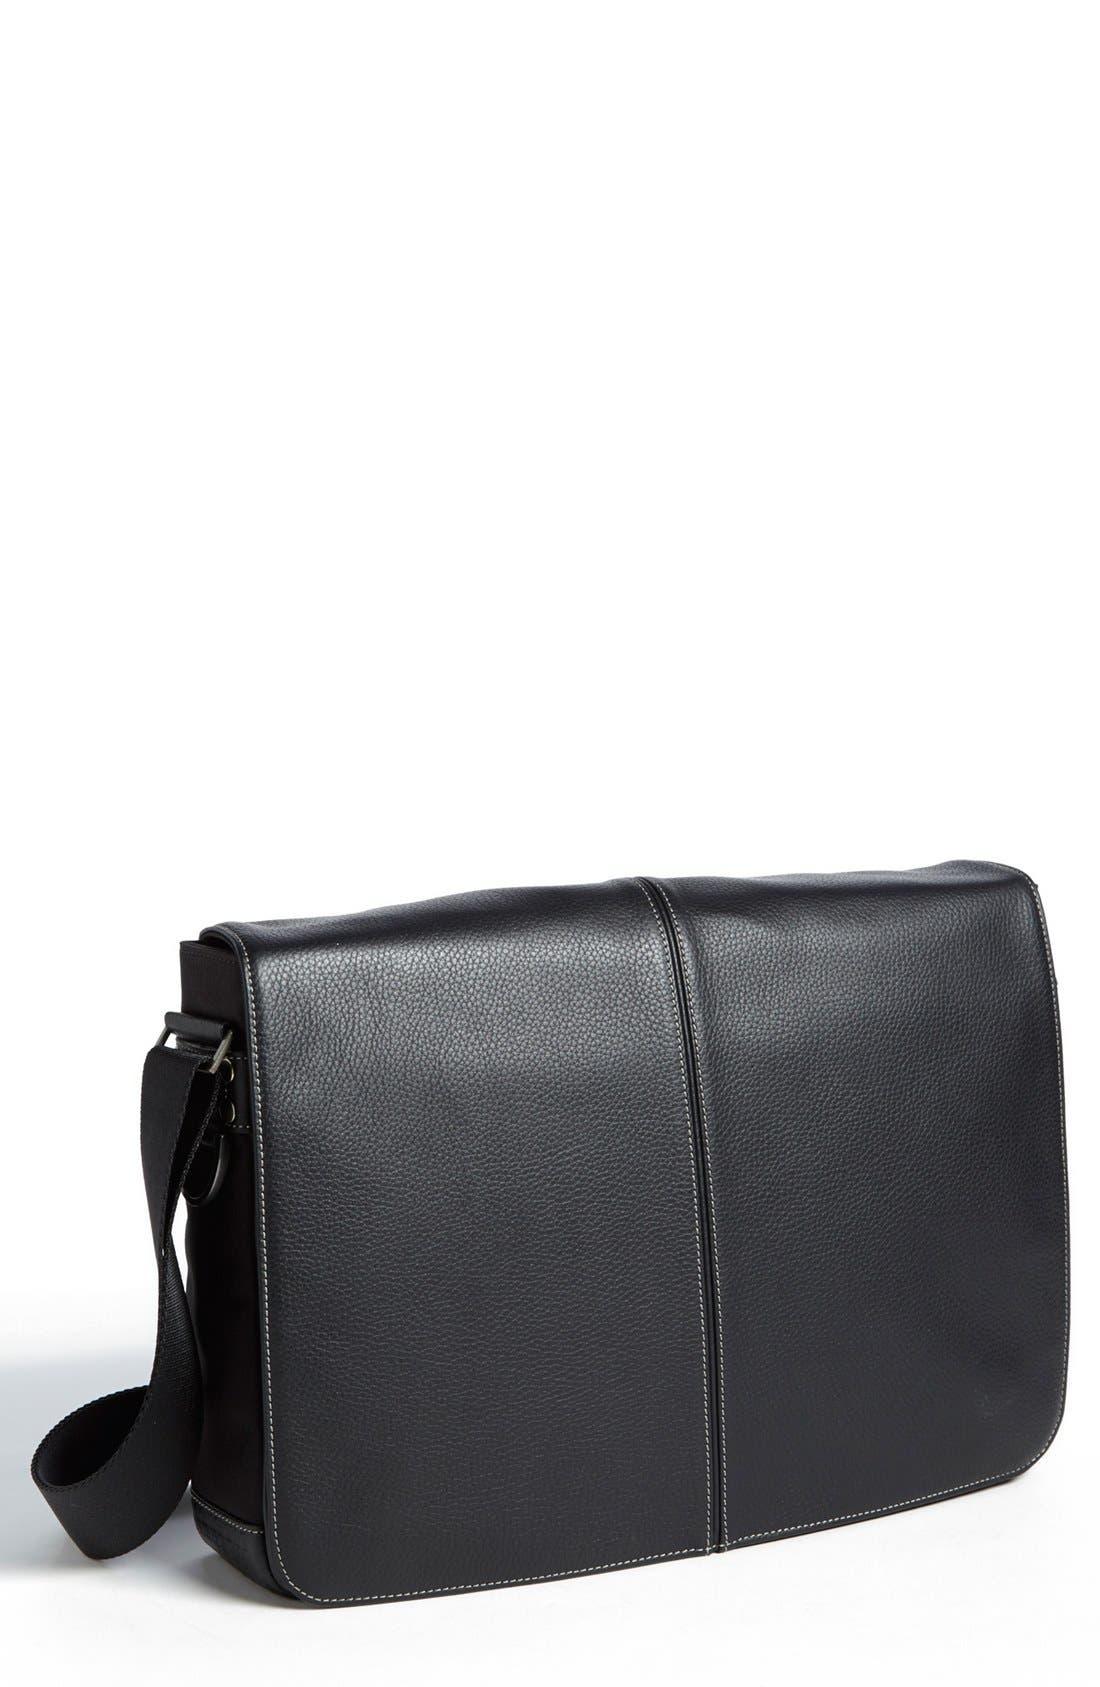 Tyler Slim Leather Laptop Briefcase,                         Main,                         color, BLACK/ KHAKI